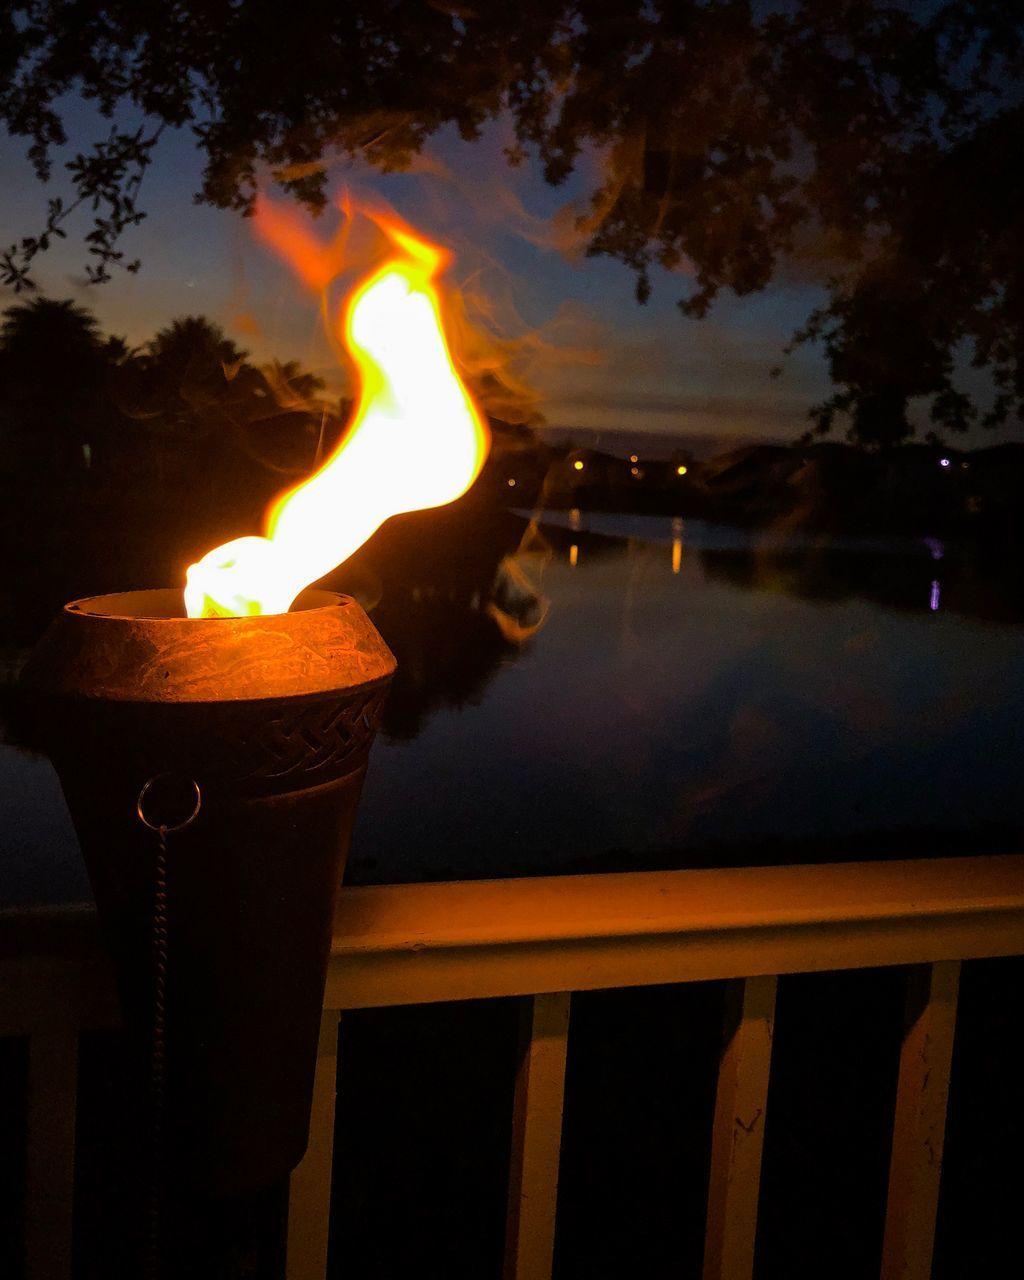 CLOSE-UP OF BURNING CANDLE AGAINST RAILING AT SUNSET